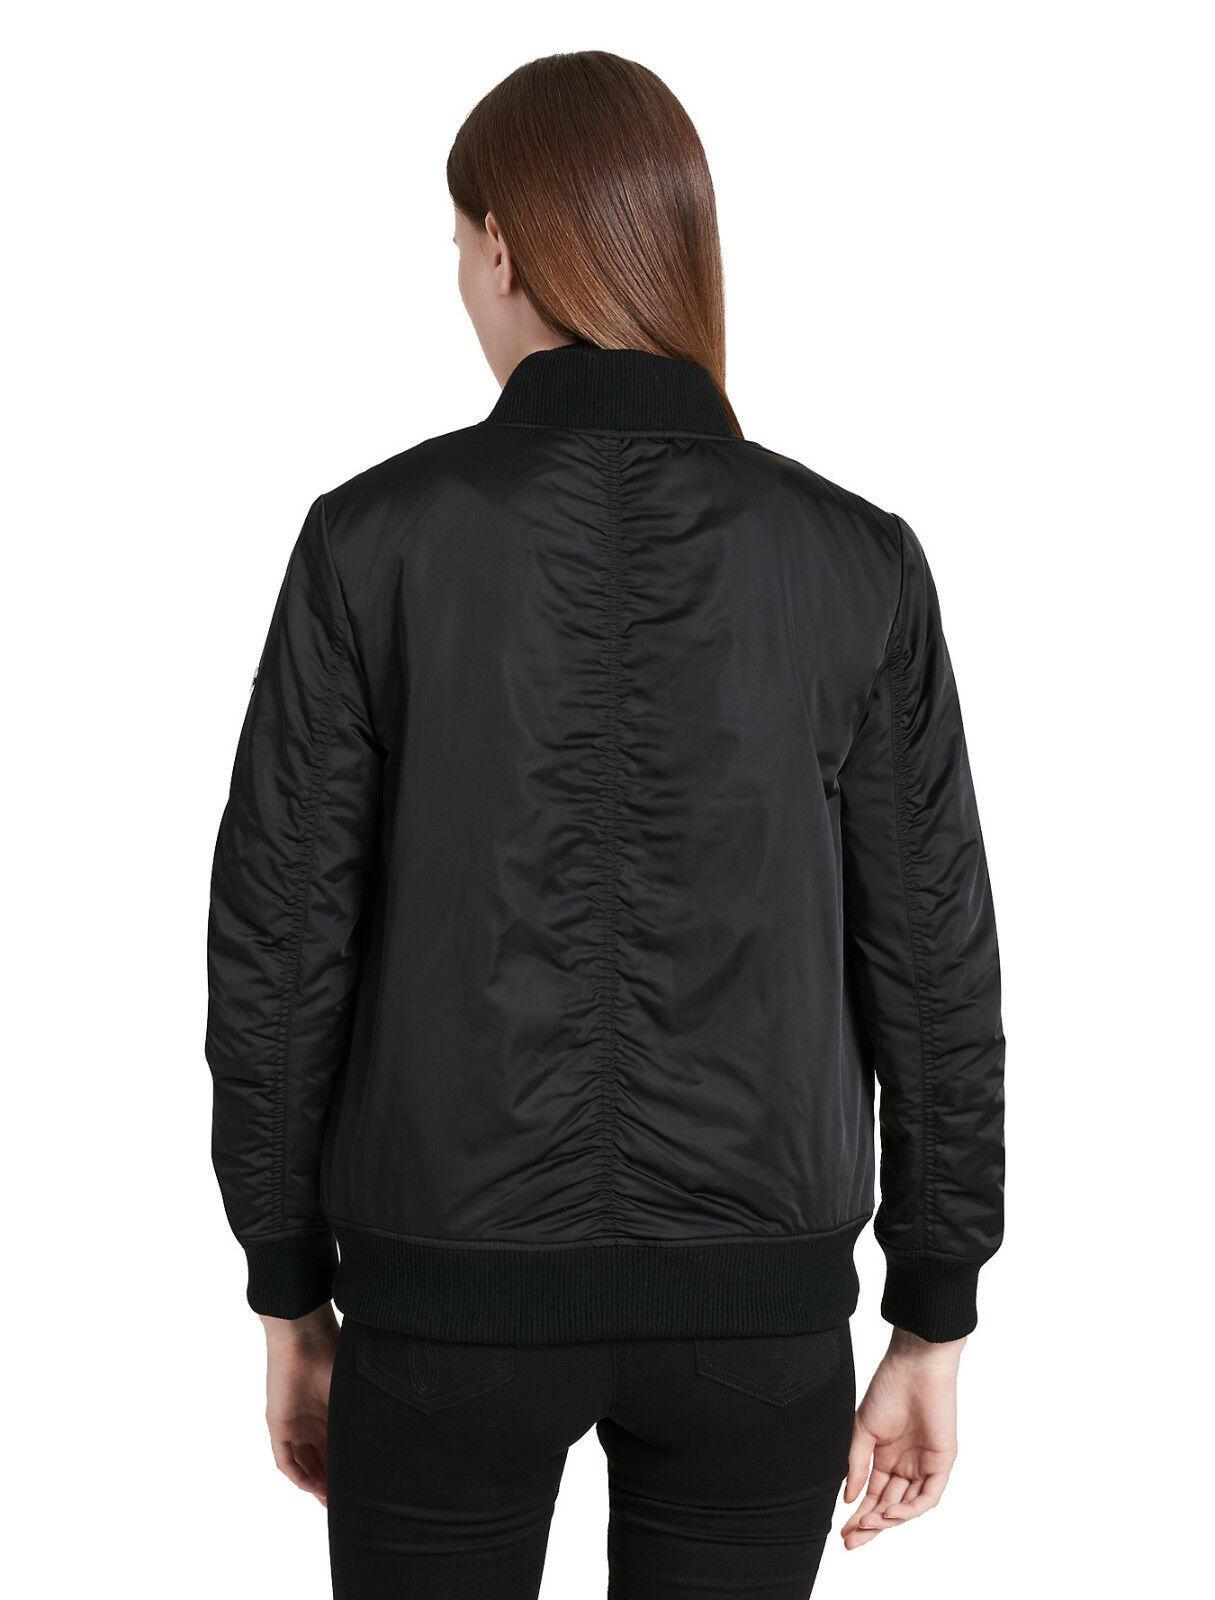 Calvin Klein Womens Black Sateen Ruched Bomber Jacket Coat Sz X-Large XL 7145-1